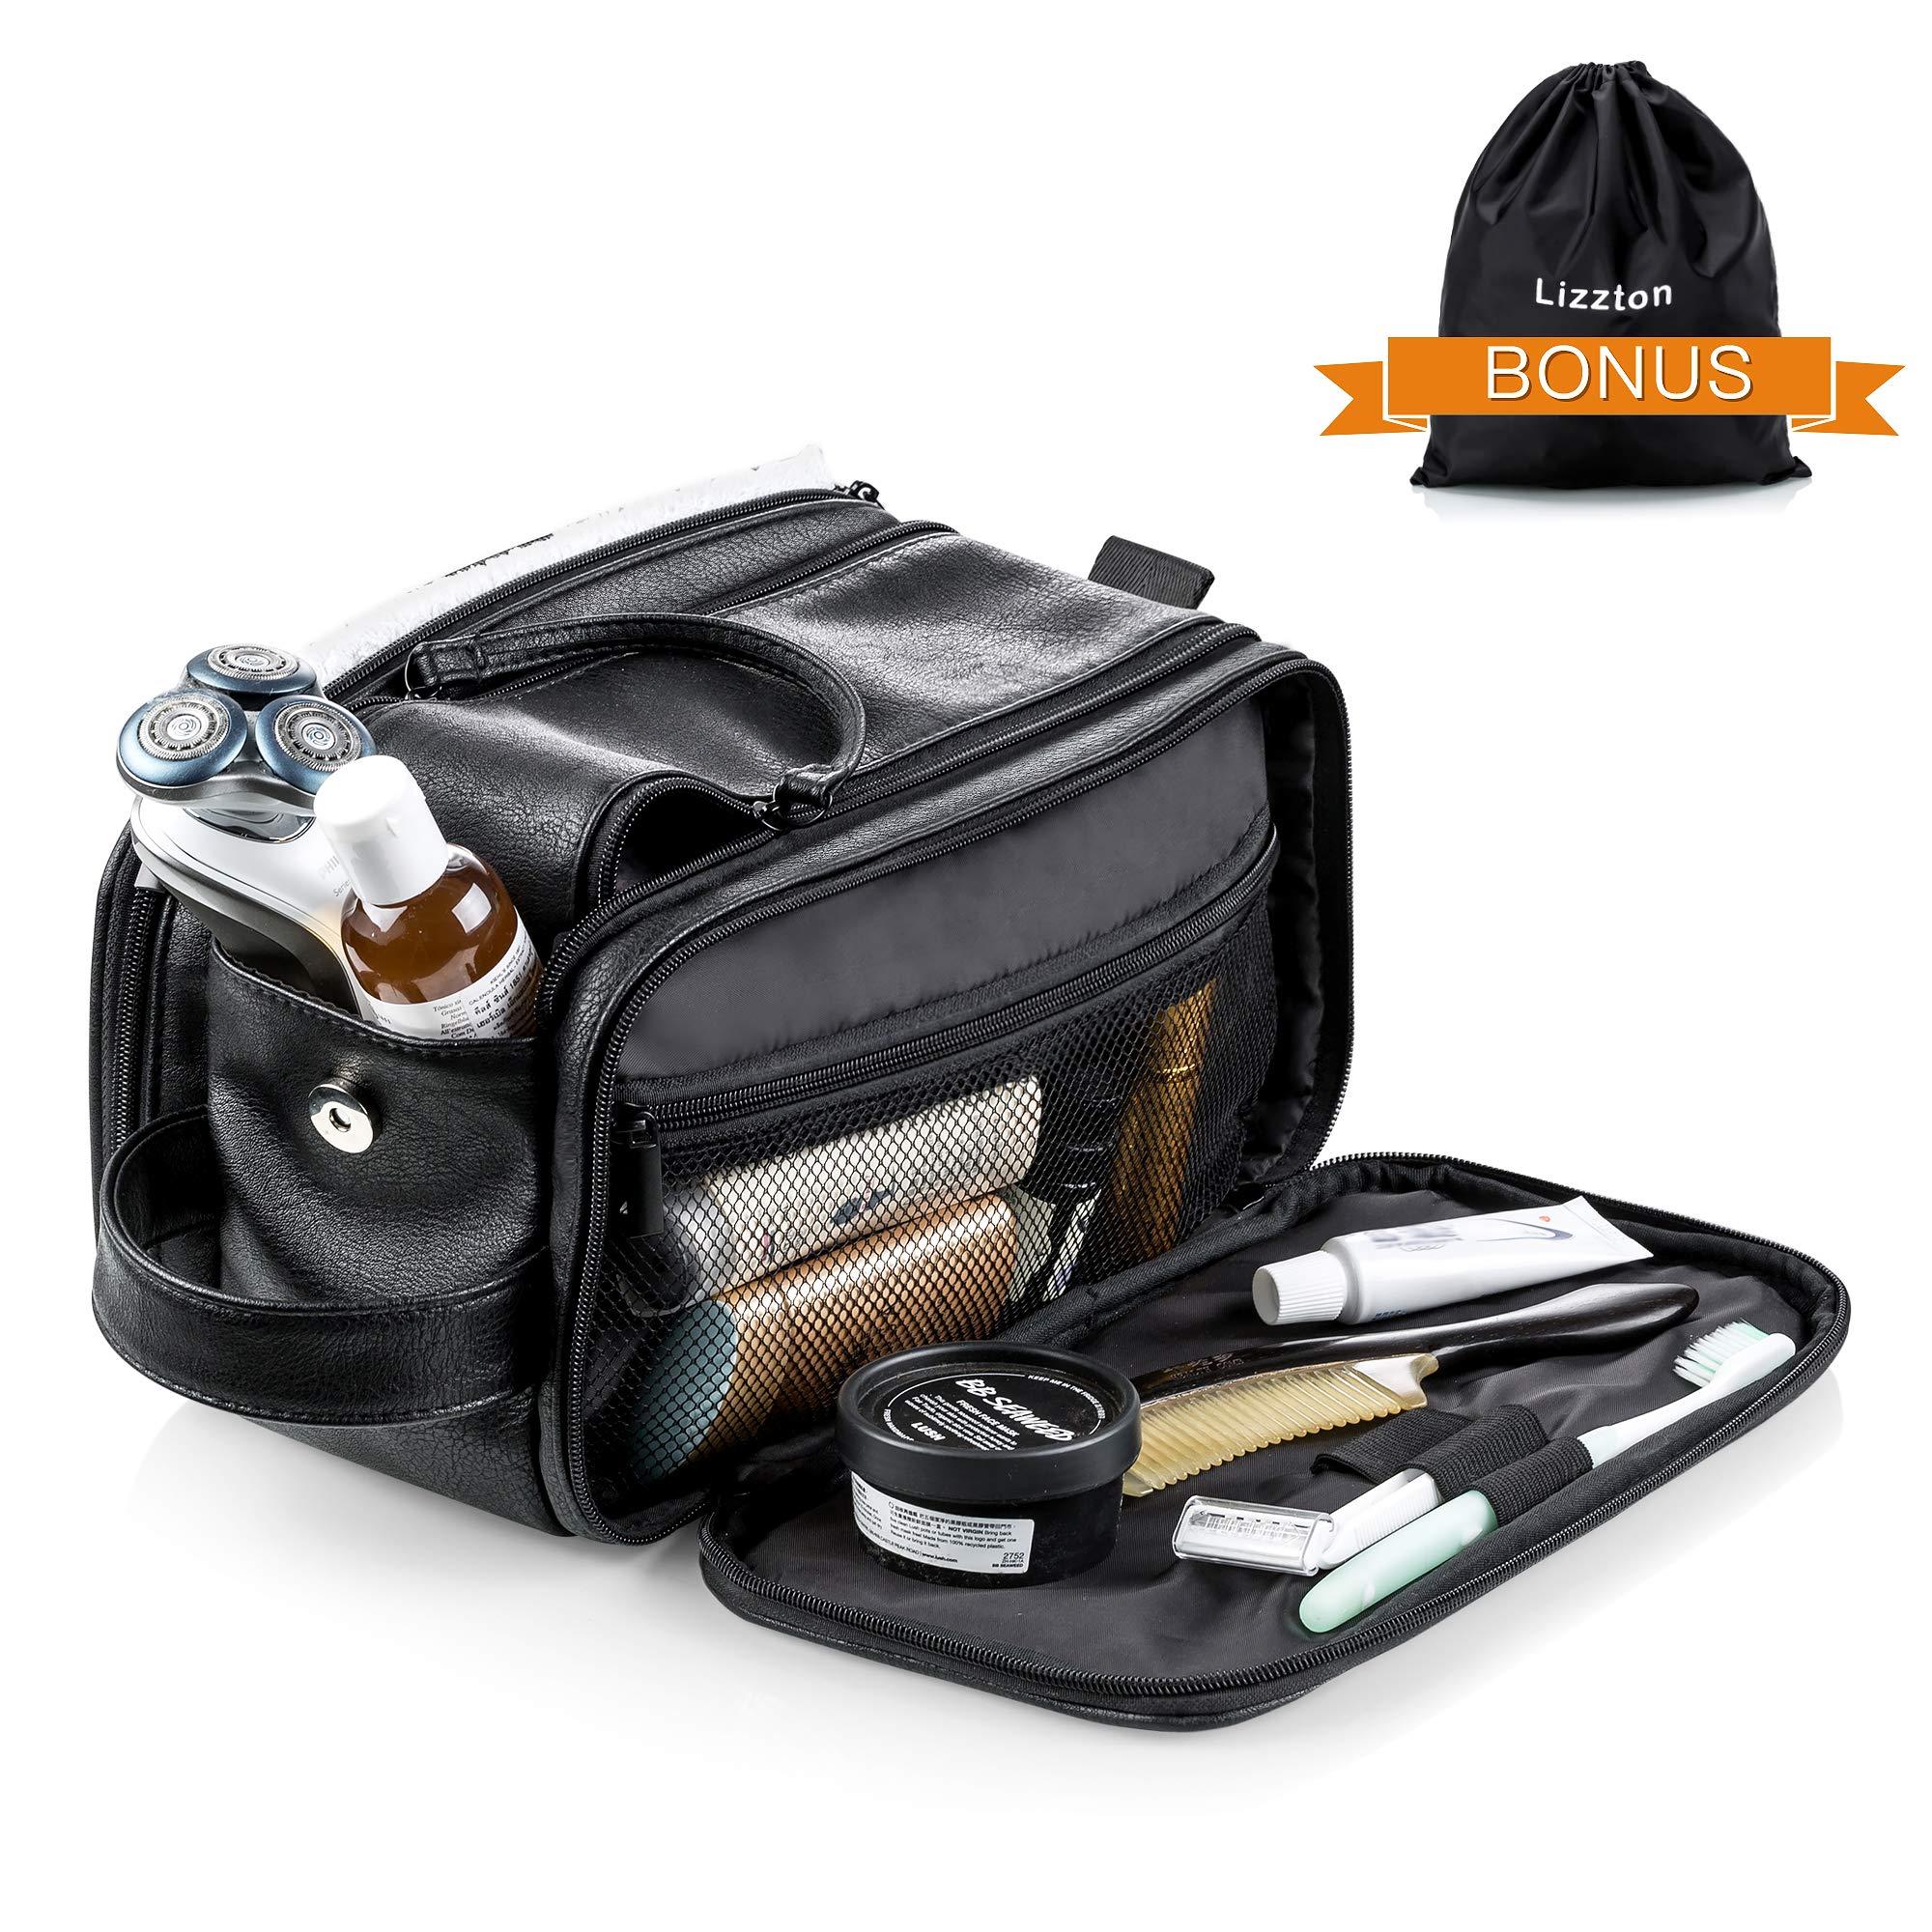 Lizzton Toiletry Bag for Men Travel Shaving Dopp Kit Case Waterproof Bathroom Toiletries Organizer Leather Wash Bags